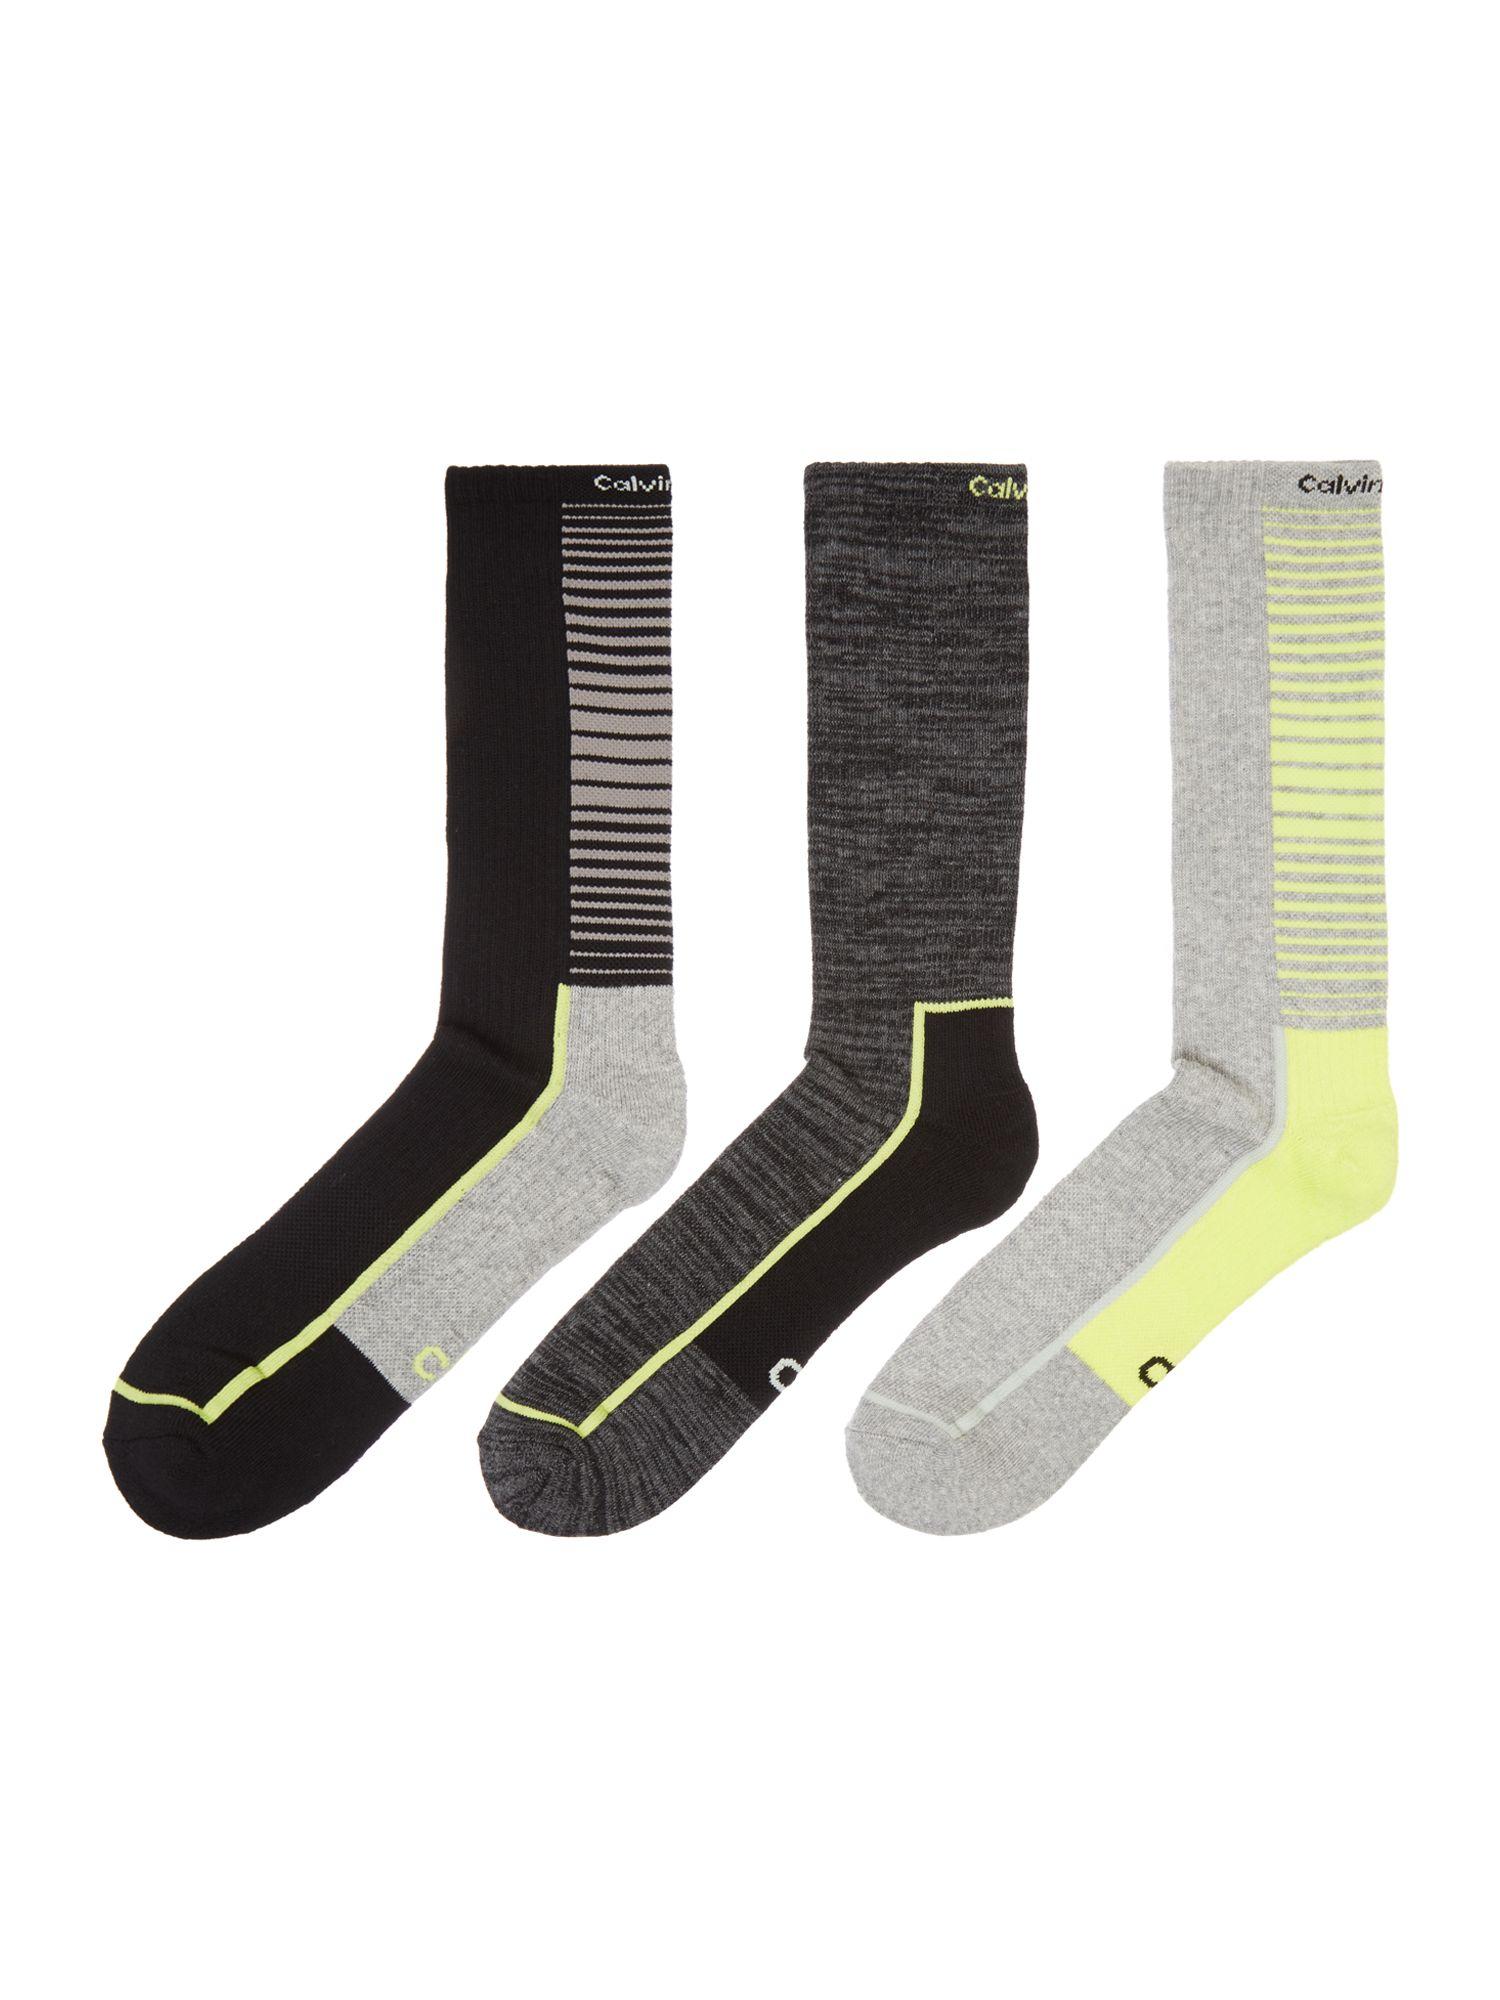 calvin klein 3 pack coolpass crew socks in multicolor for men lyst. Black Bedroom Furniture Sets. Home Design Ideas